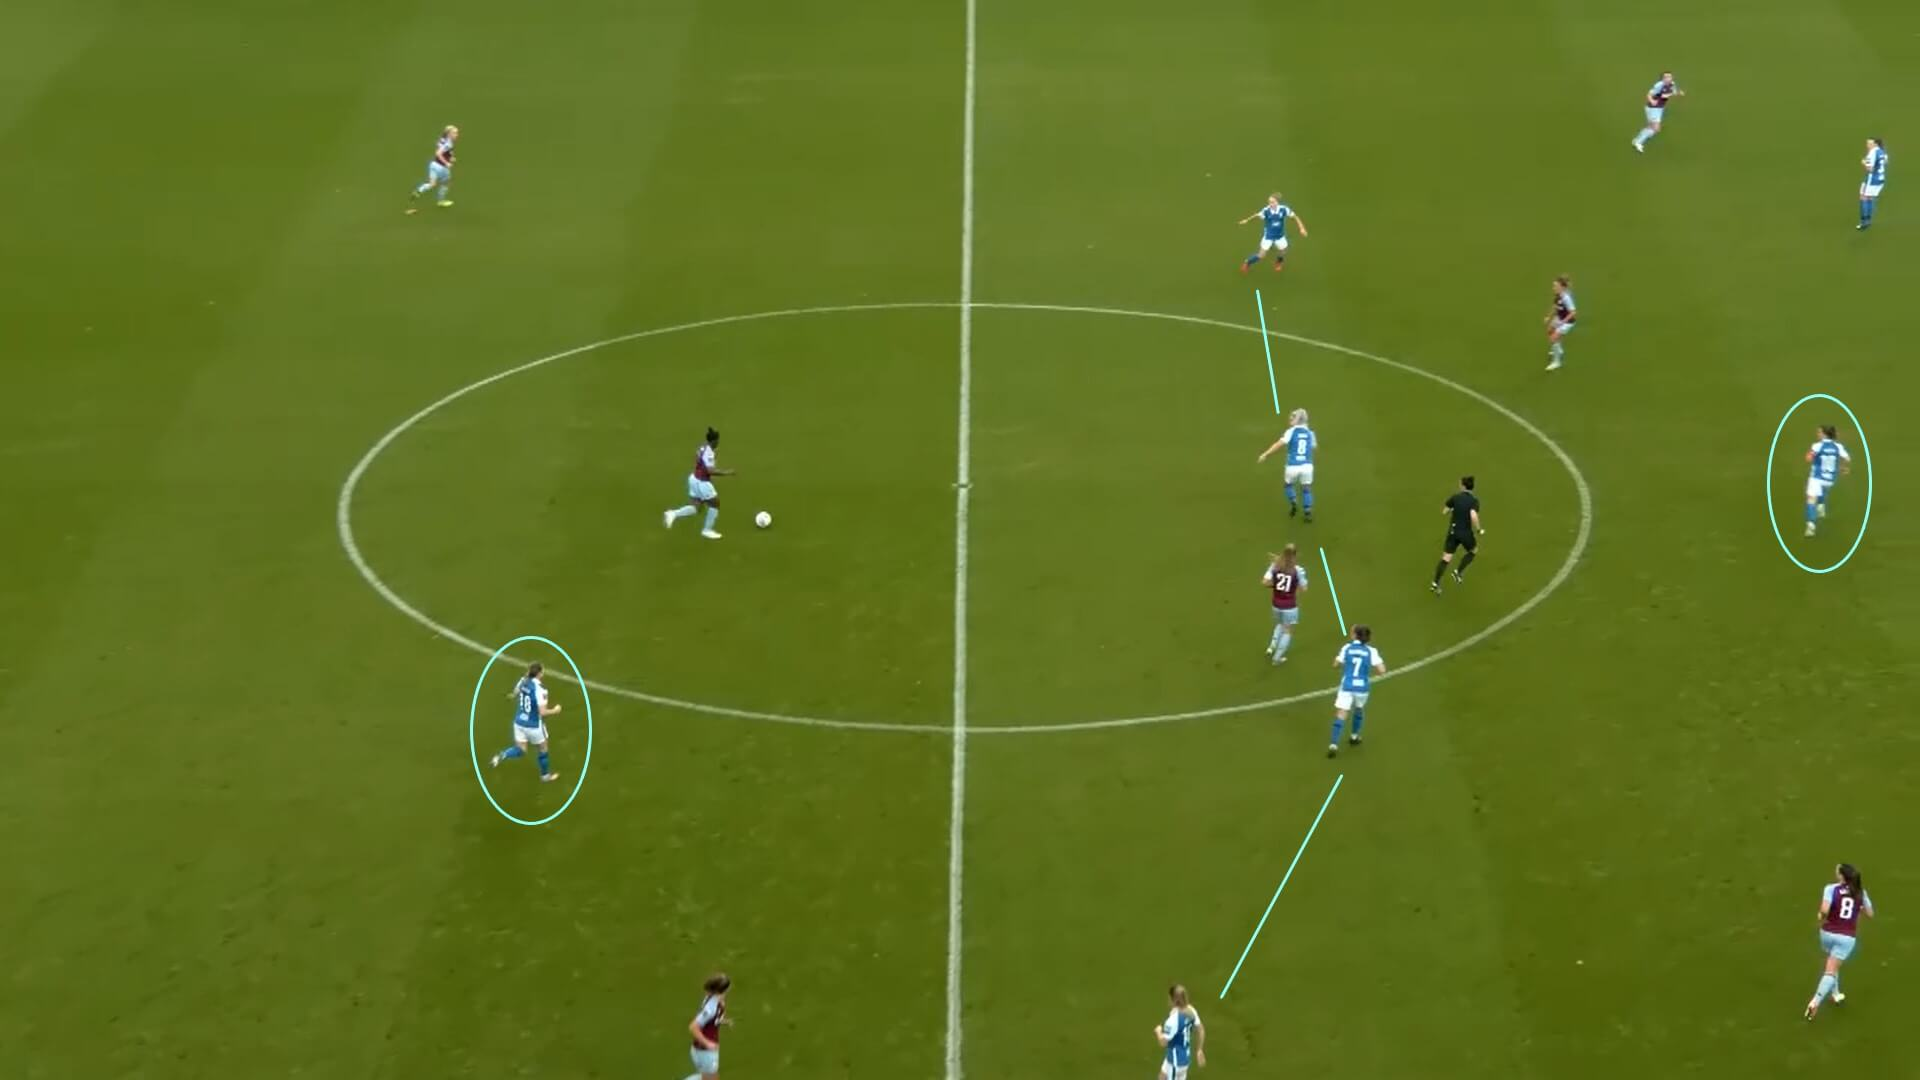 FAWSL 2020/2021: Aston Villa Women v Birmingham City Women - tactical analysis tactics